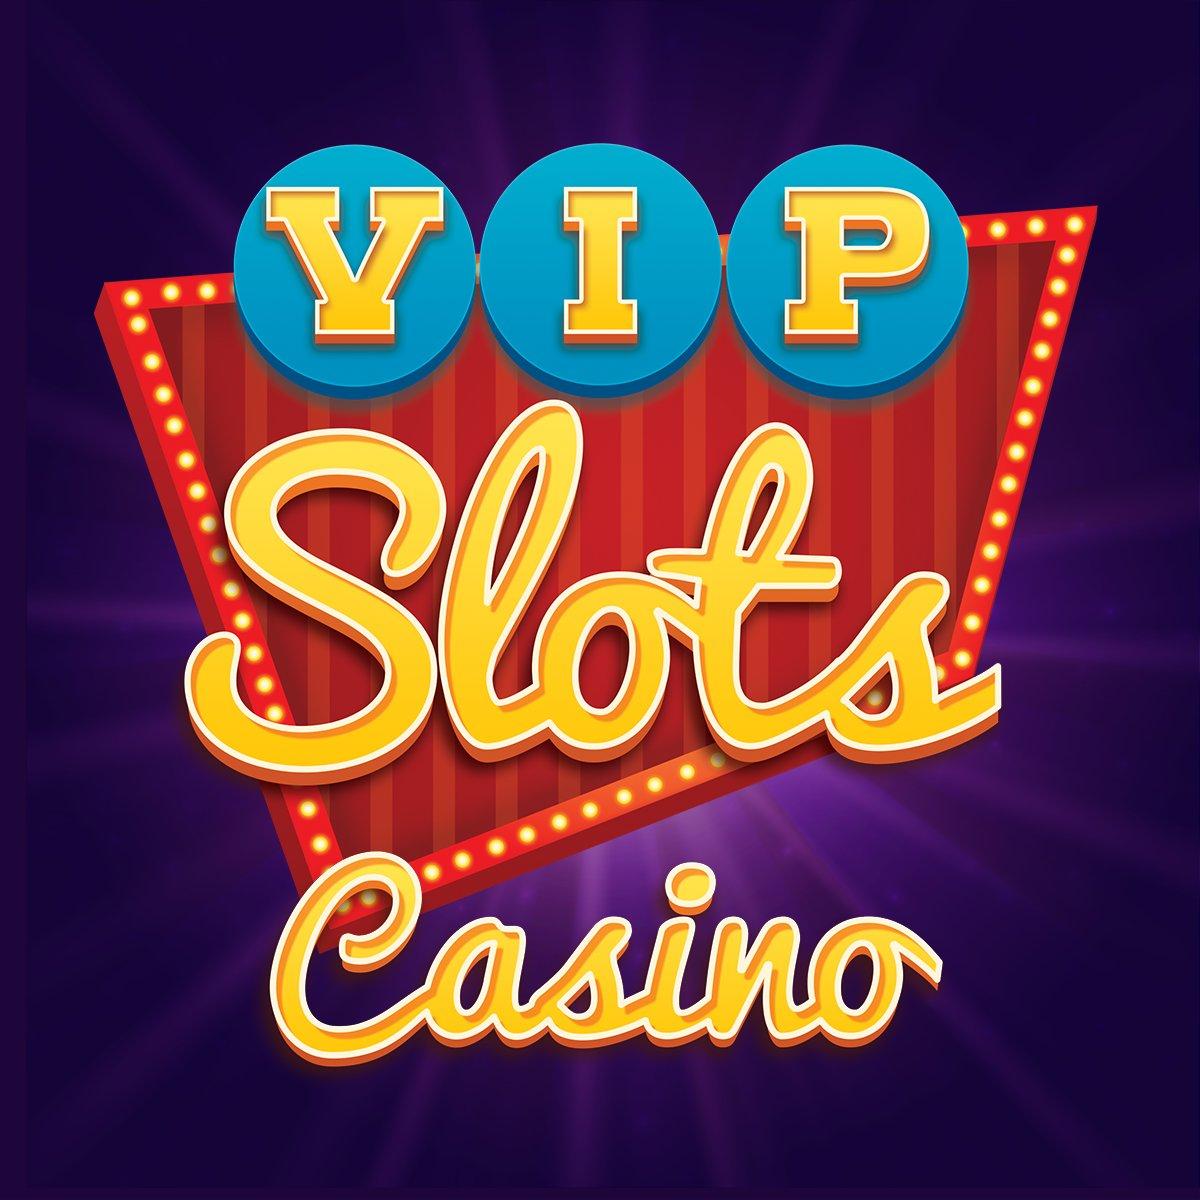 Vip slots free bonus codes